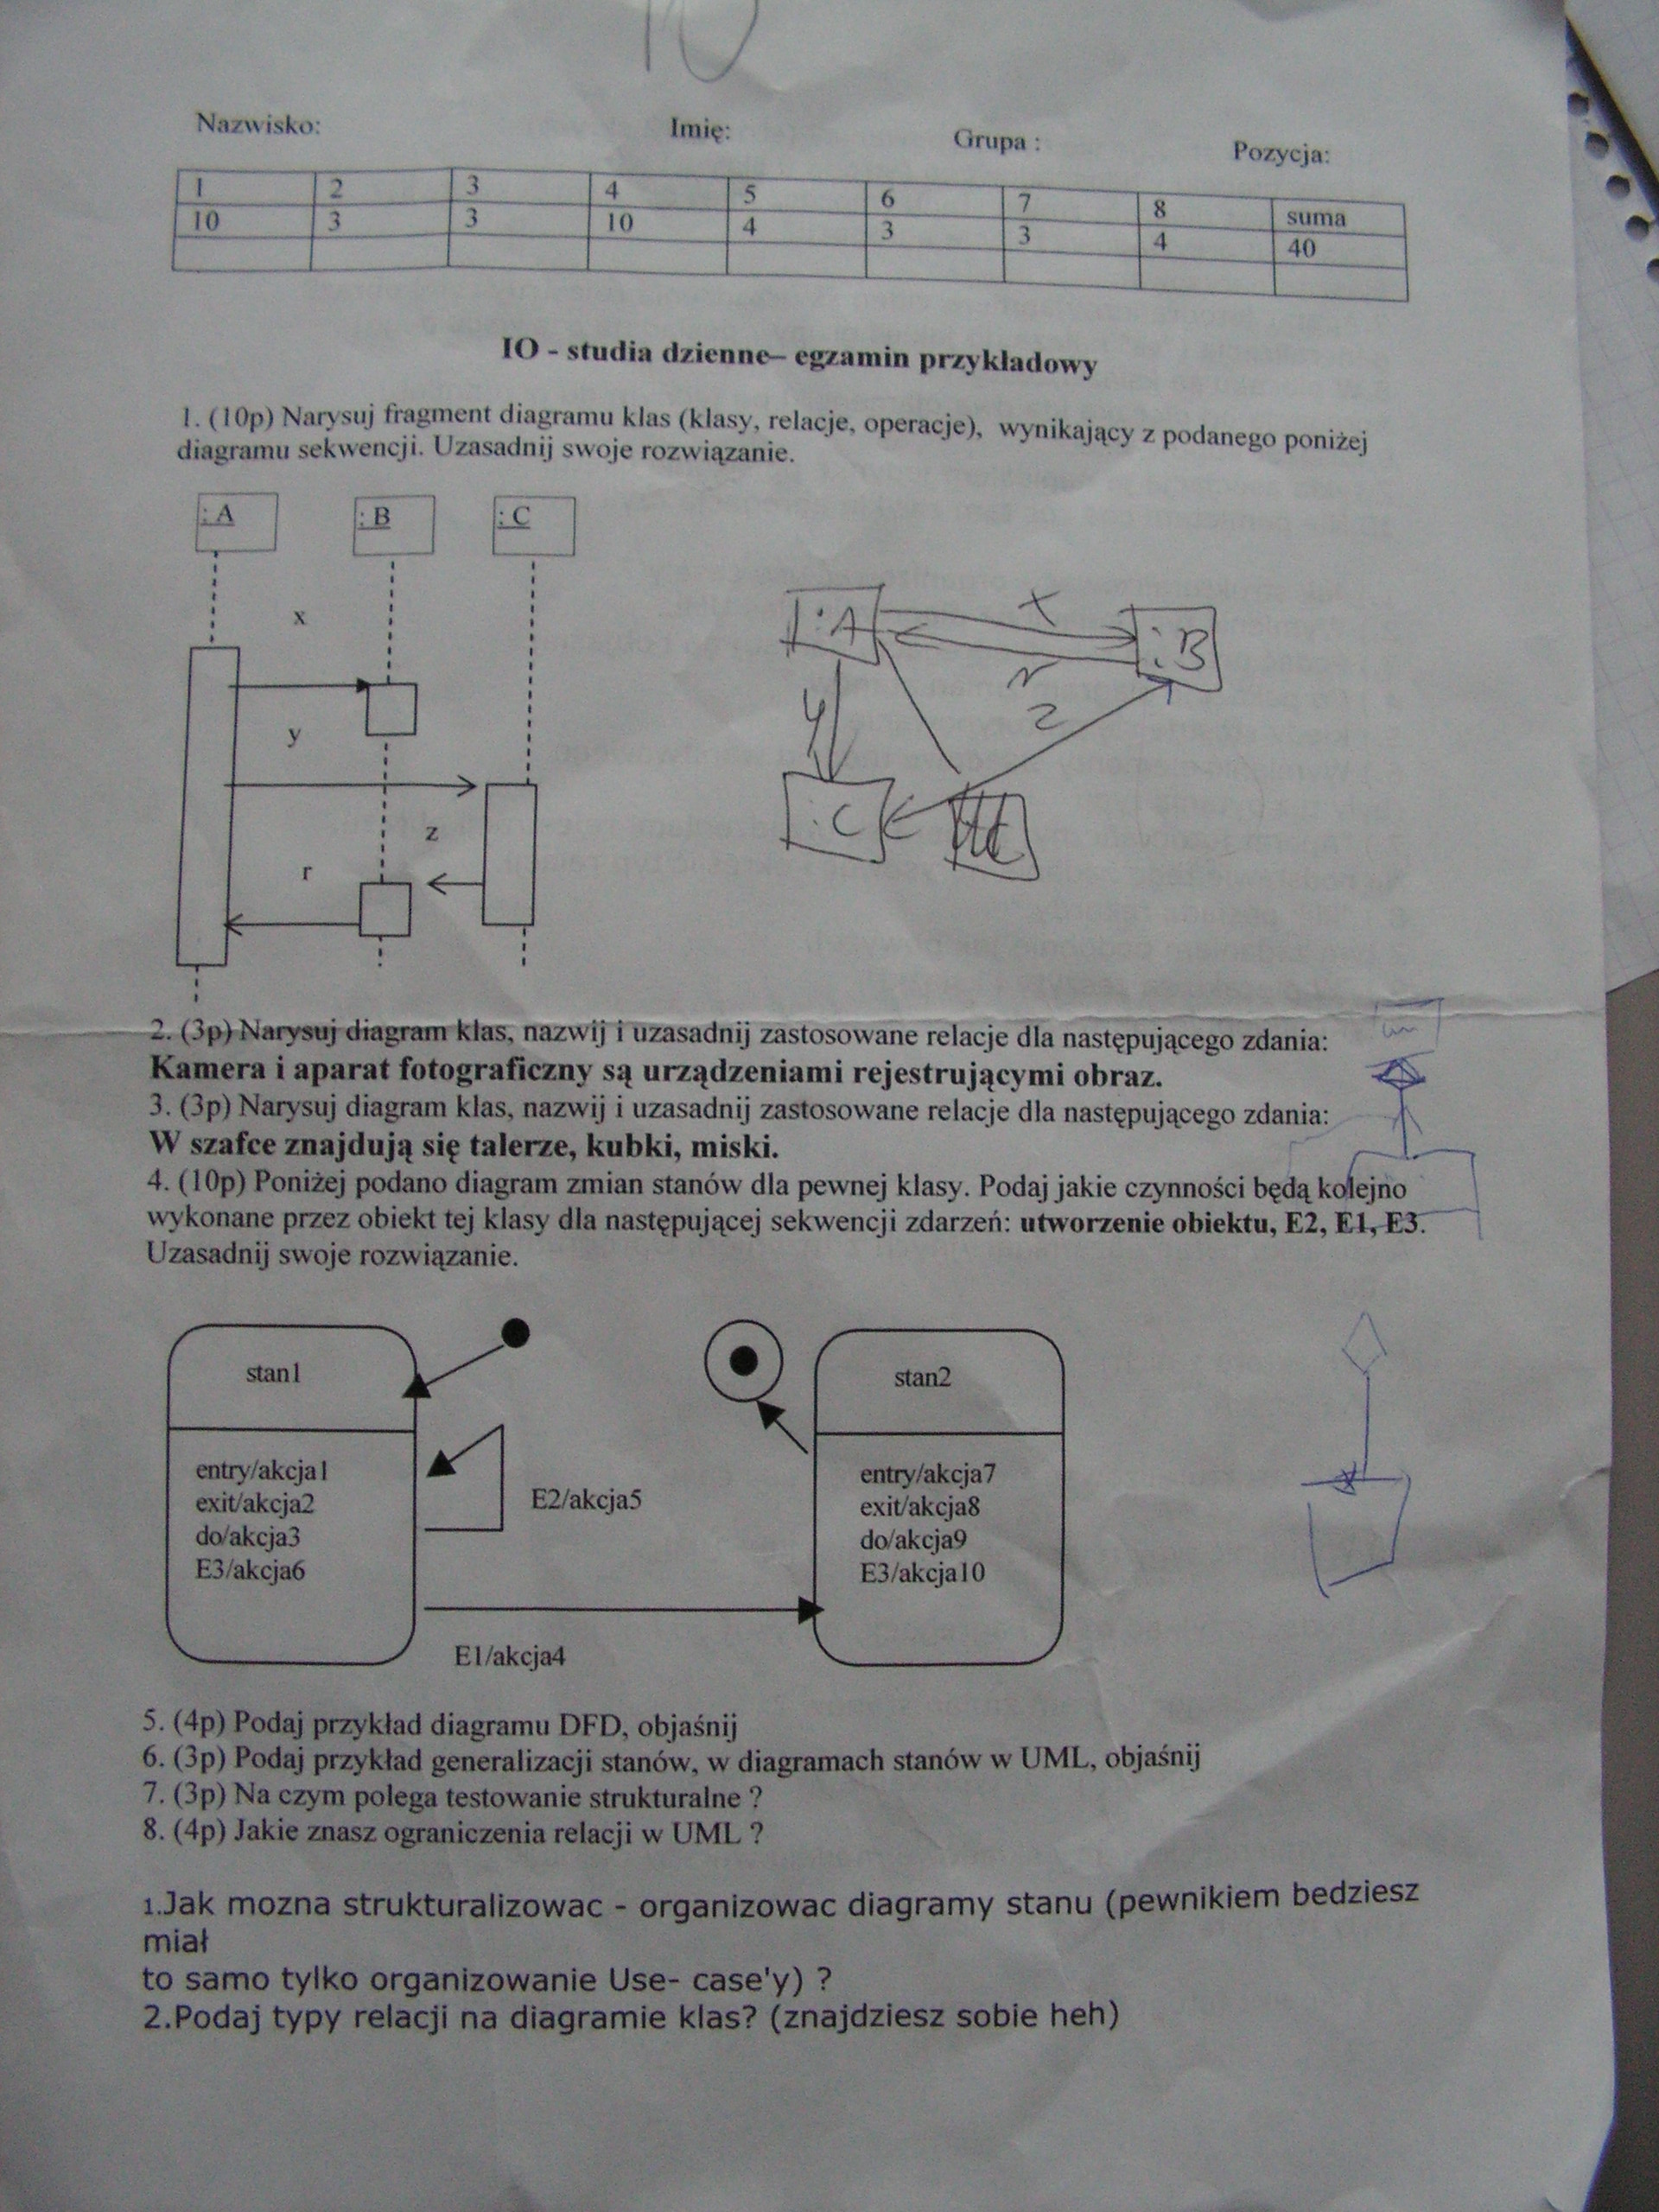 Index of wsisizinzynieria oprogramowaniaforum pict0005 ccuart Image collections